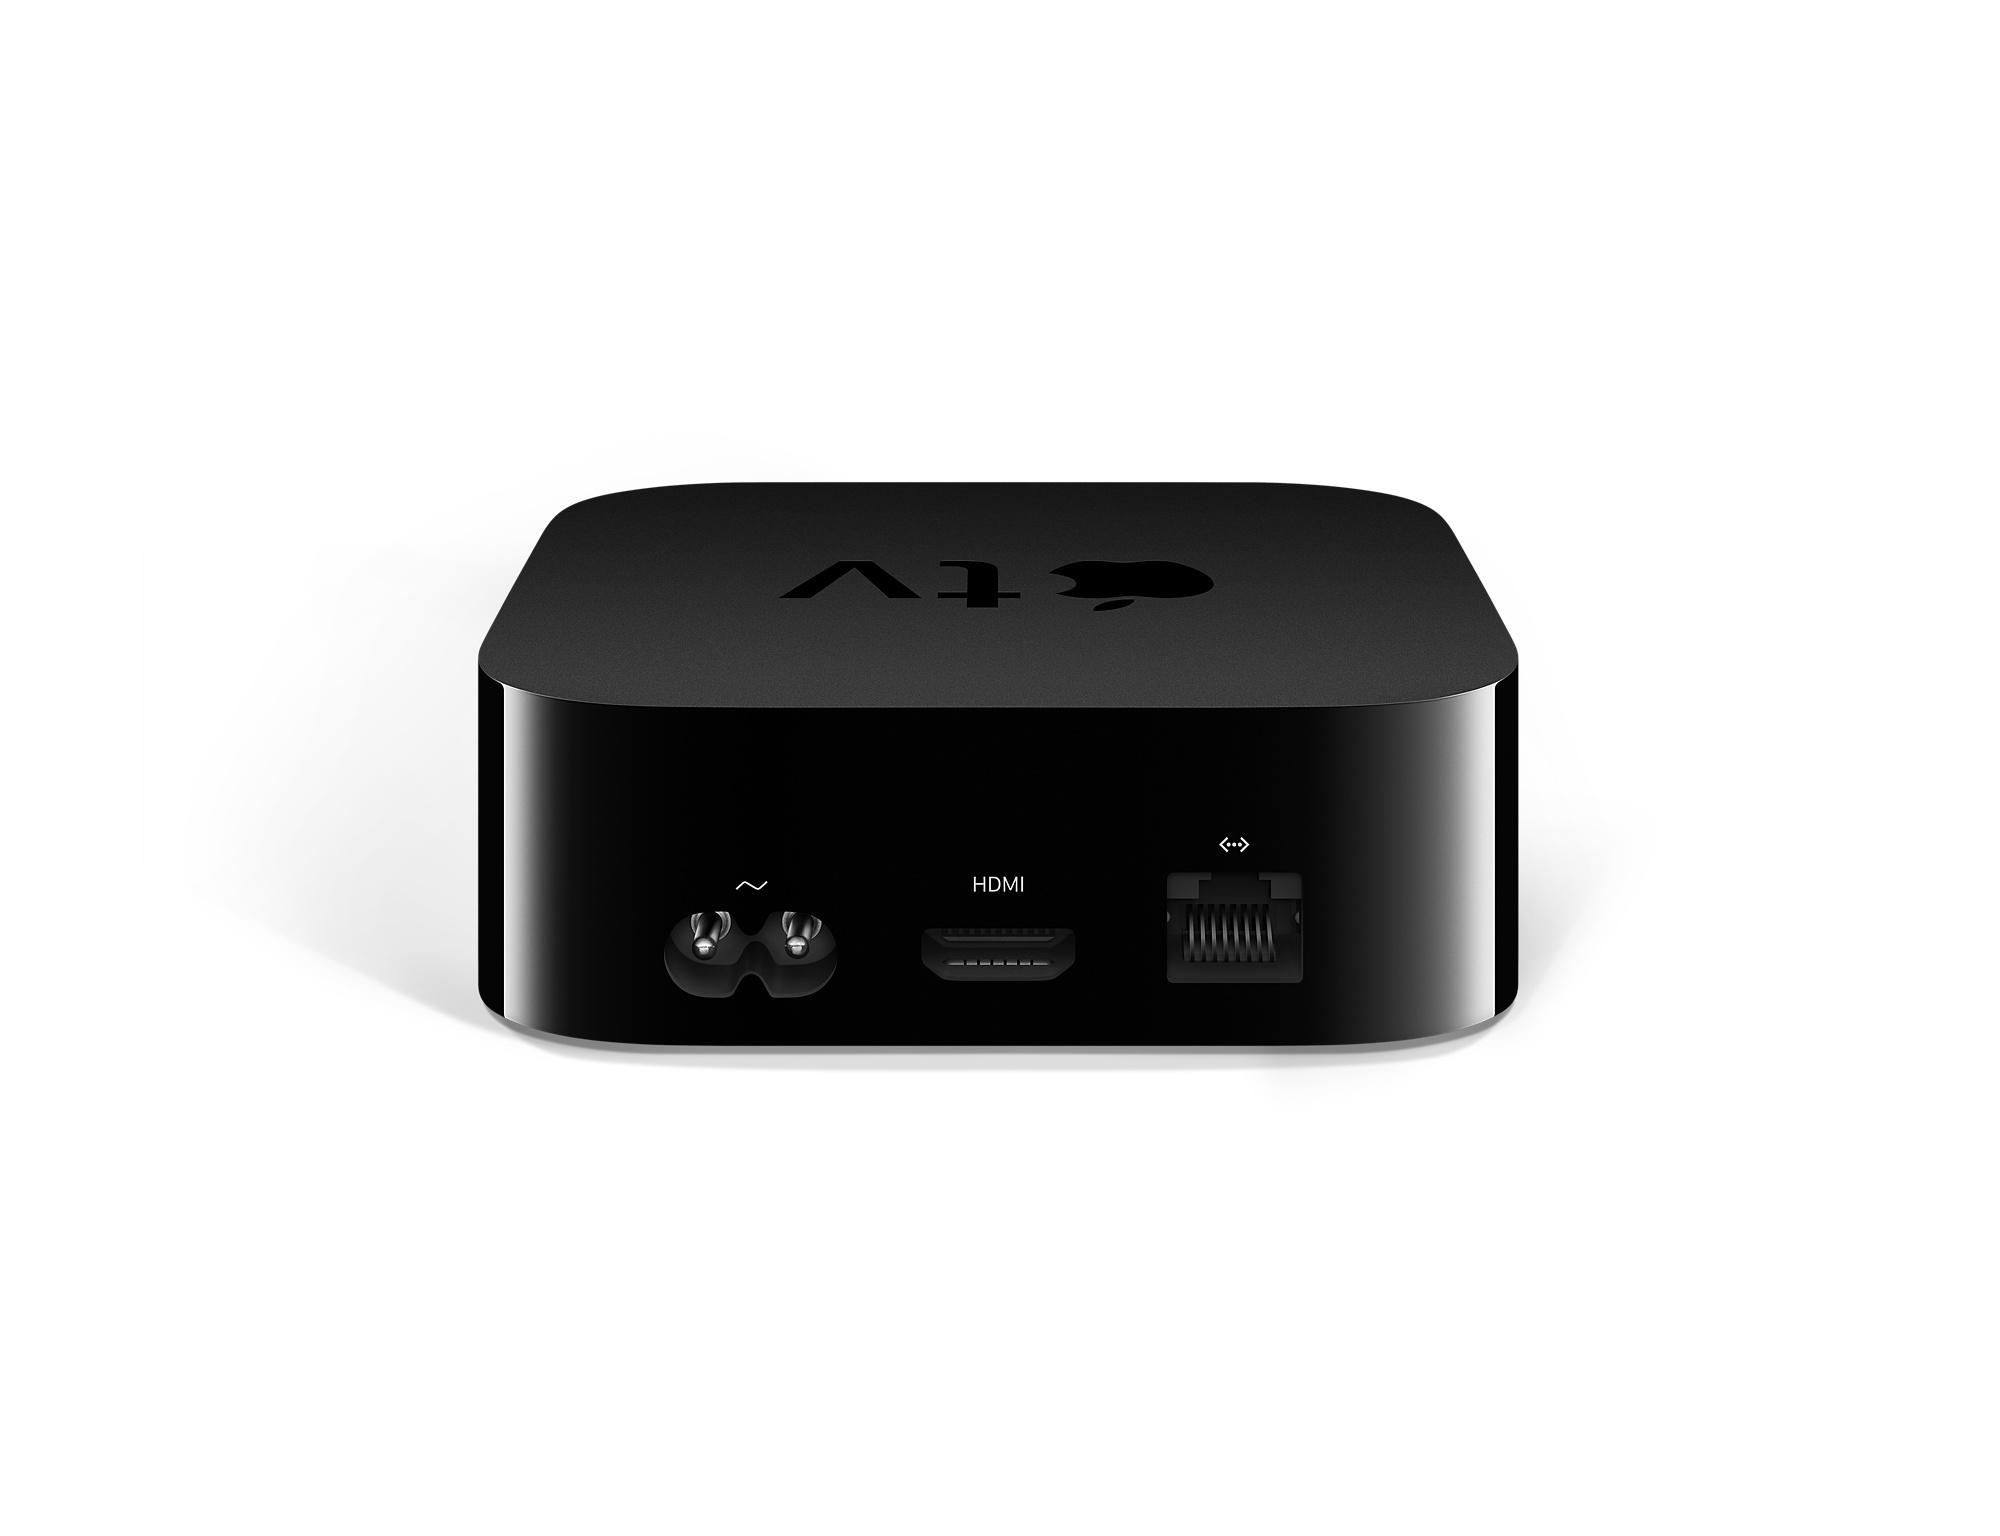 Que vaut l'Apple TV 4K face à la Nvidia Shield TV